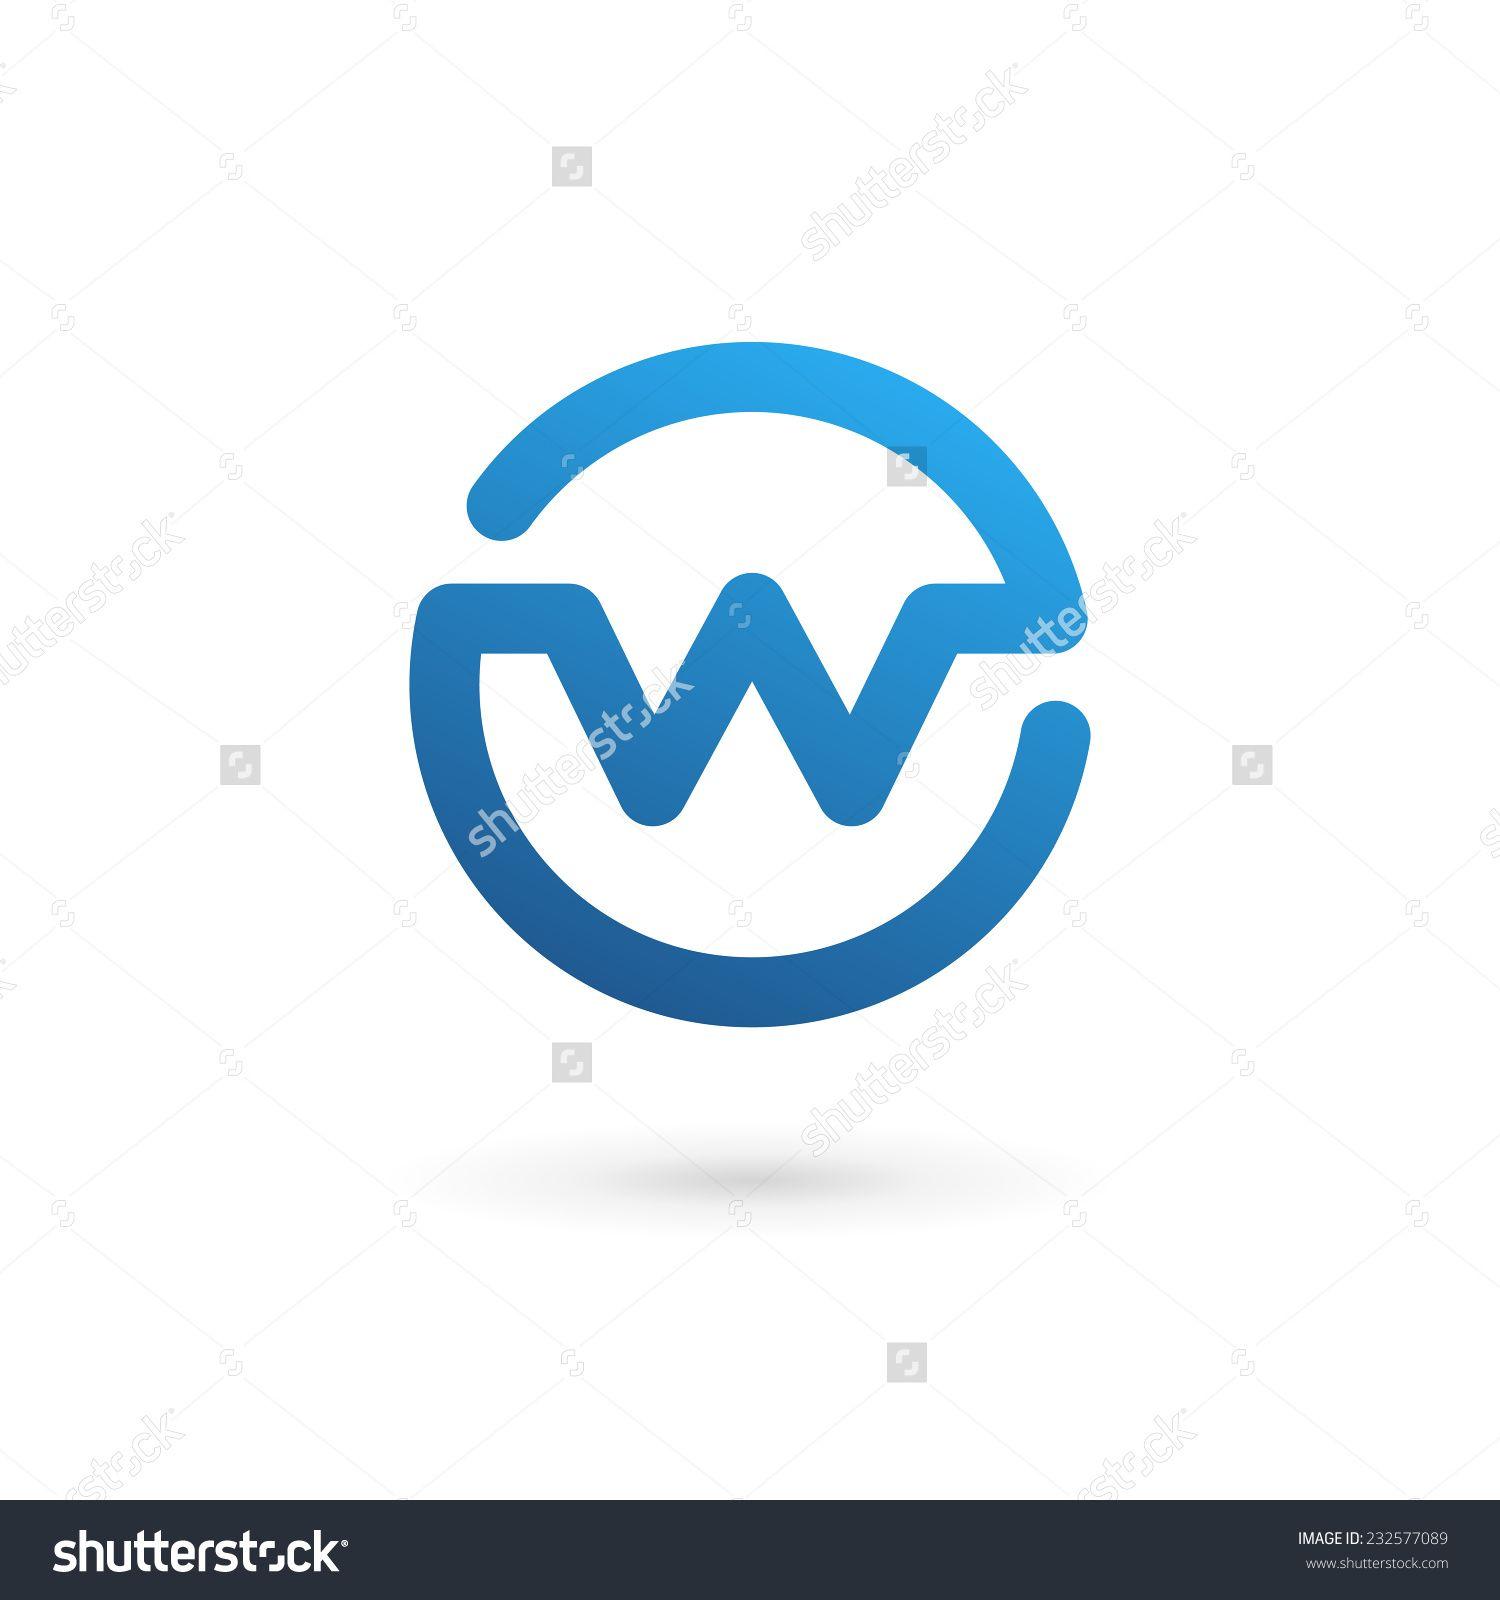 Letter W logo icon design template elements   Logos/Icons/Symbols ...